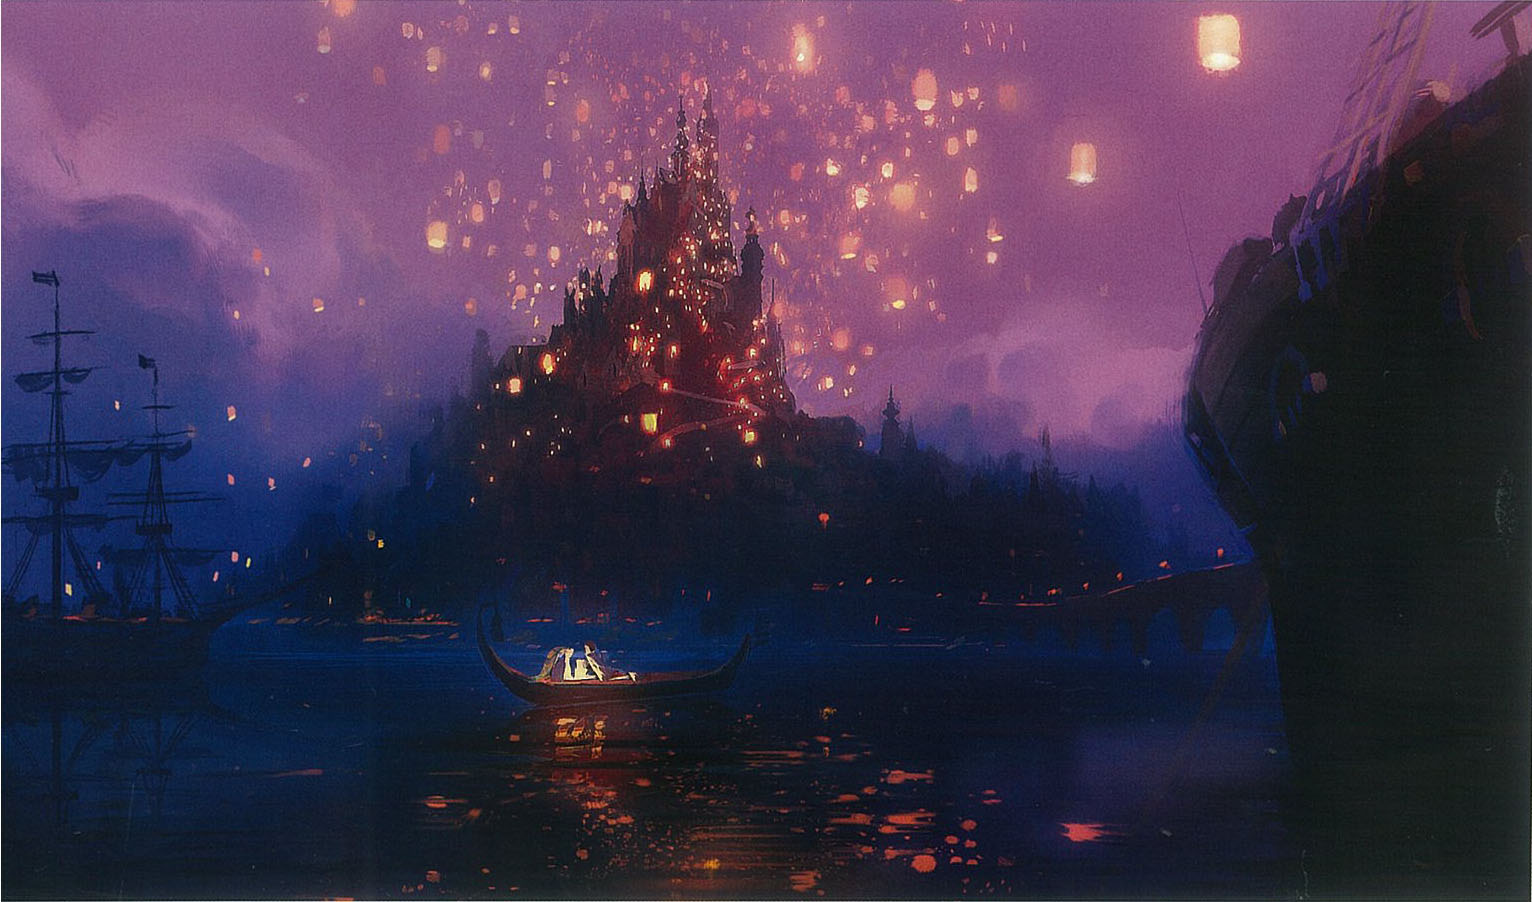 Cute Word Wallpaper Dreams Come True The Art Of Disney S Classic Fairy Tales